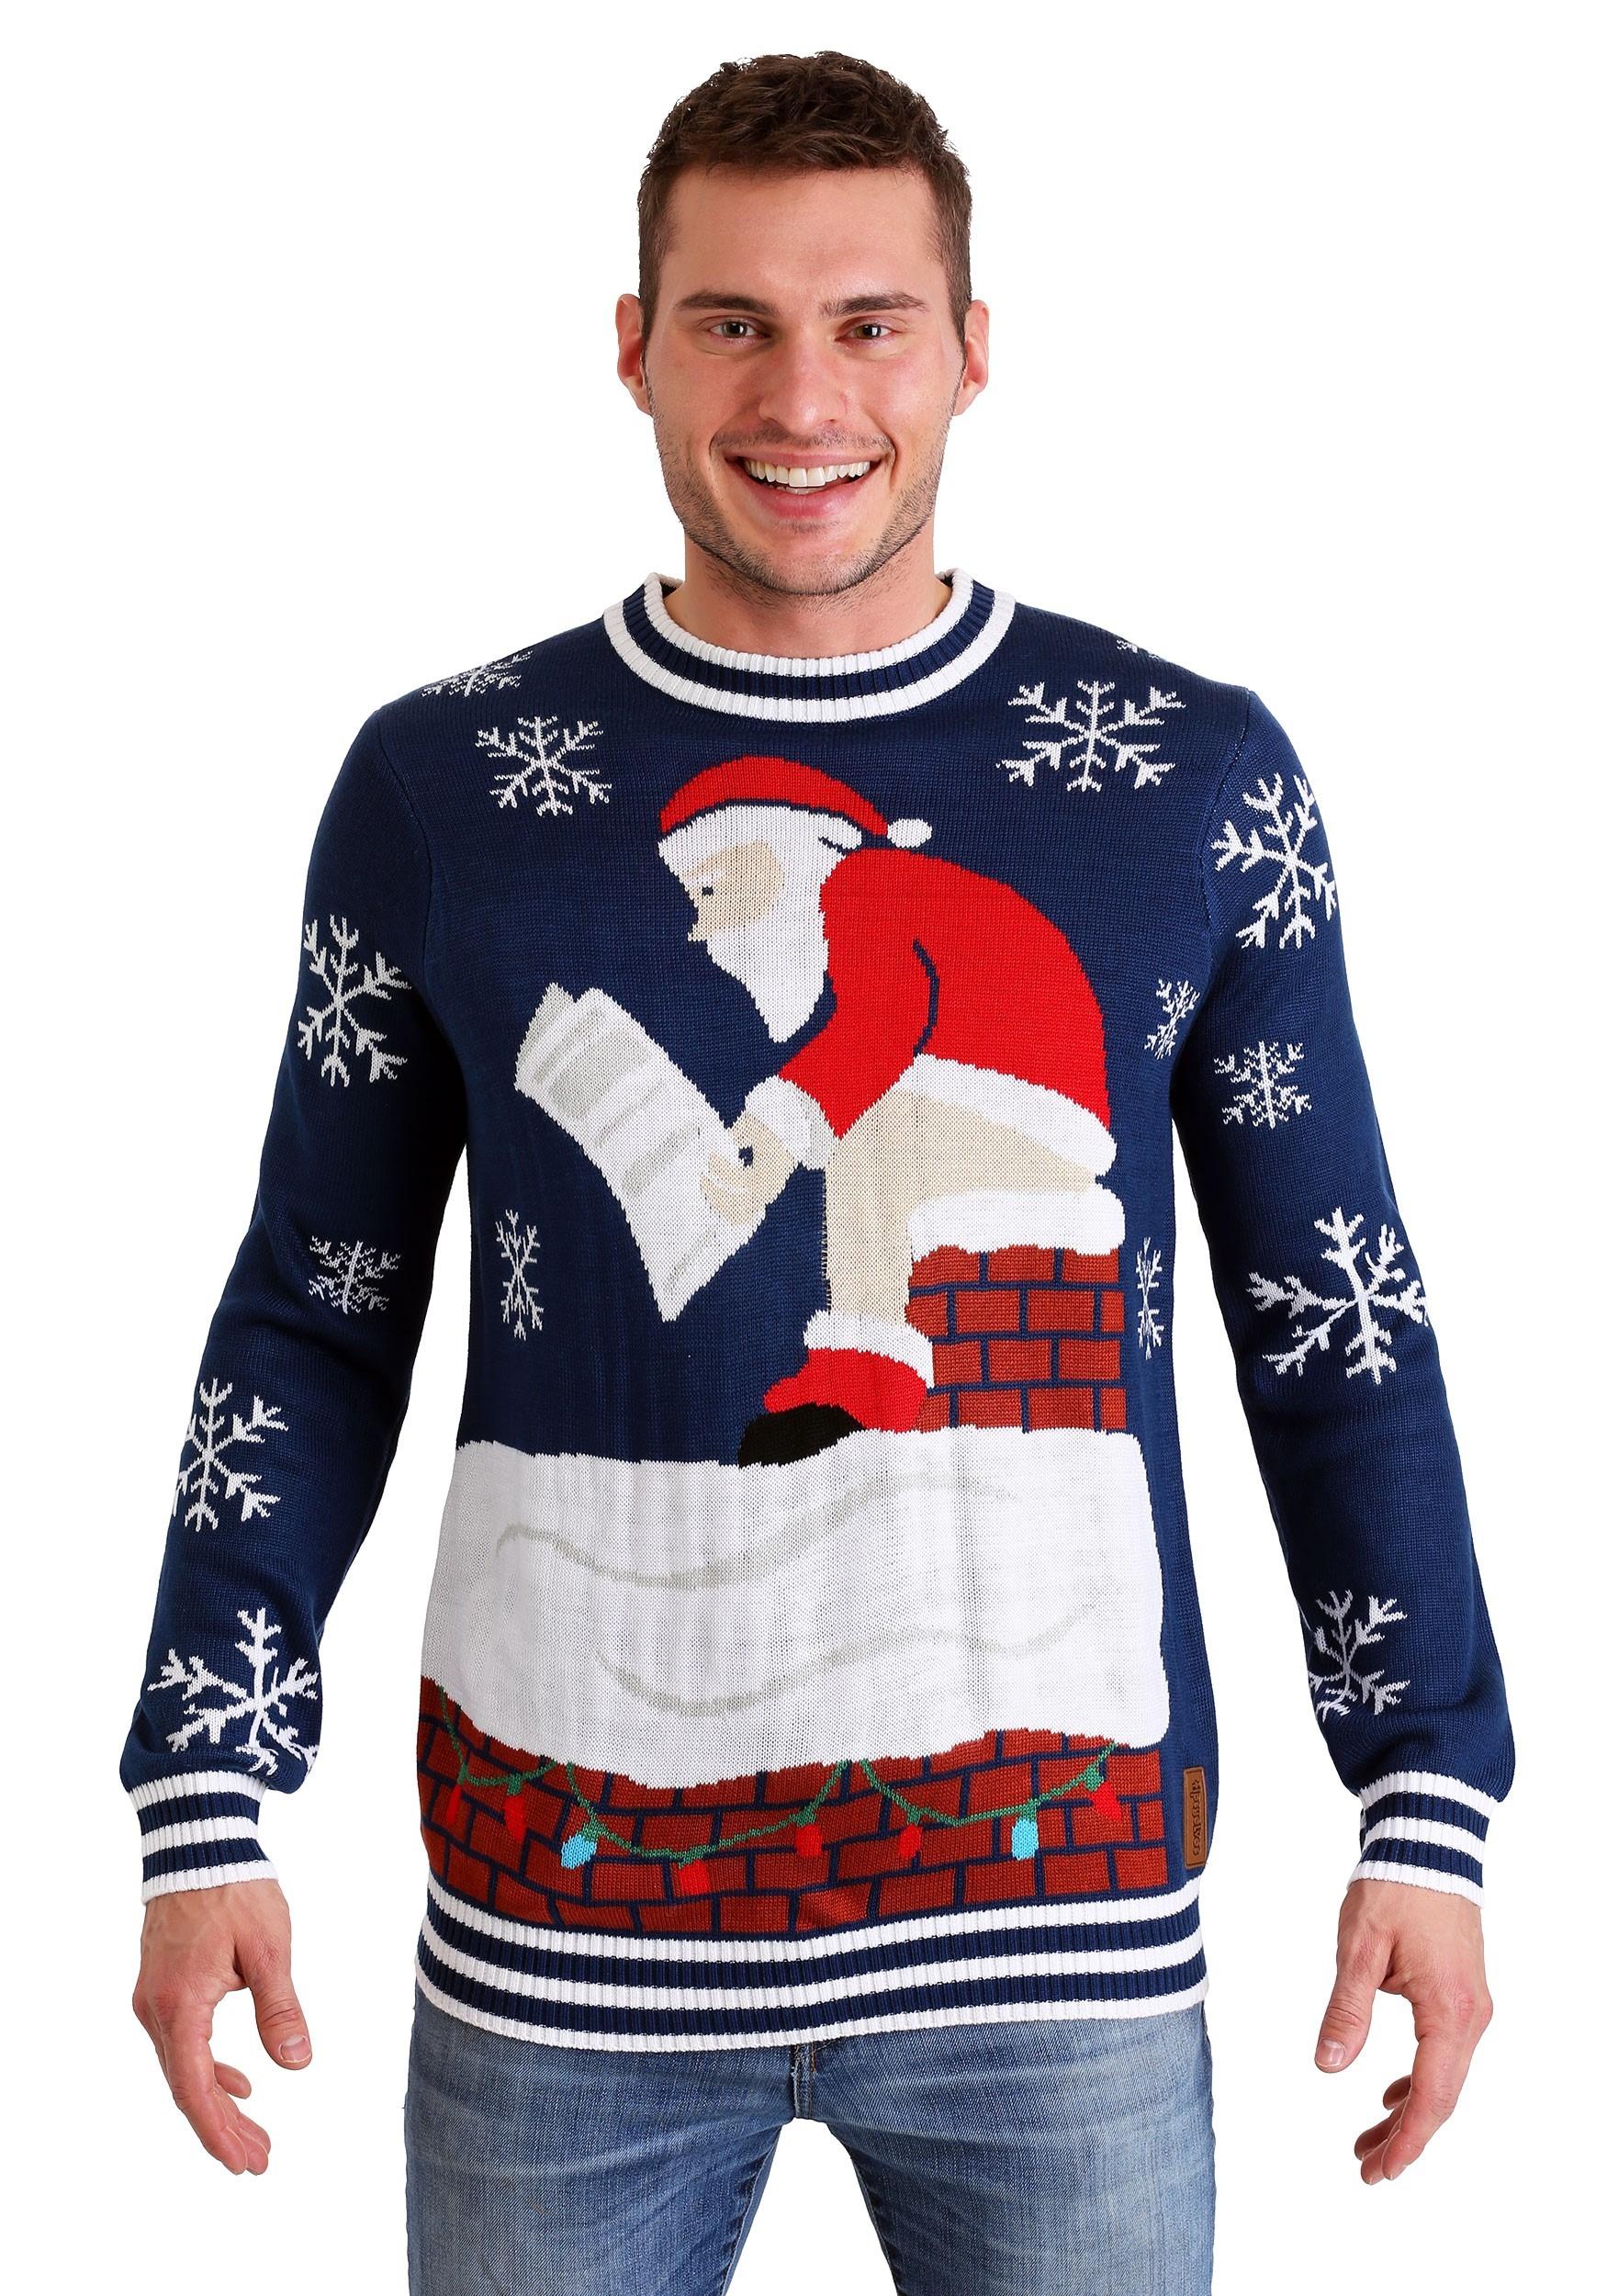 Tipsy Elves Roof Santa Ugly Christmas Sweater For Men